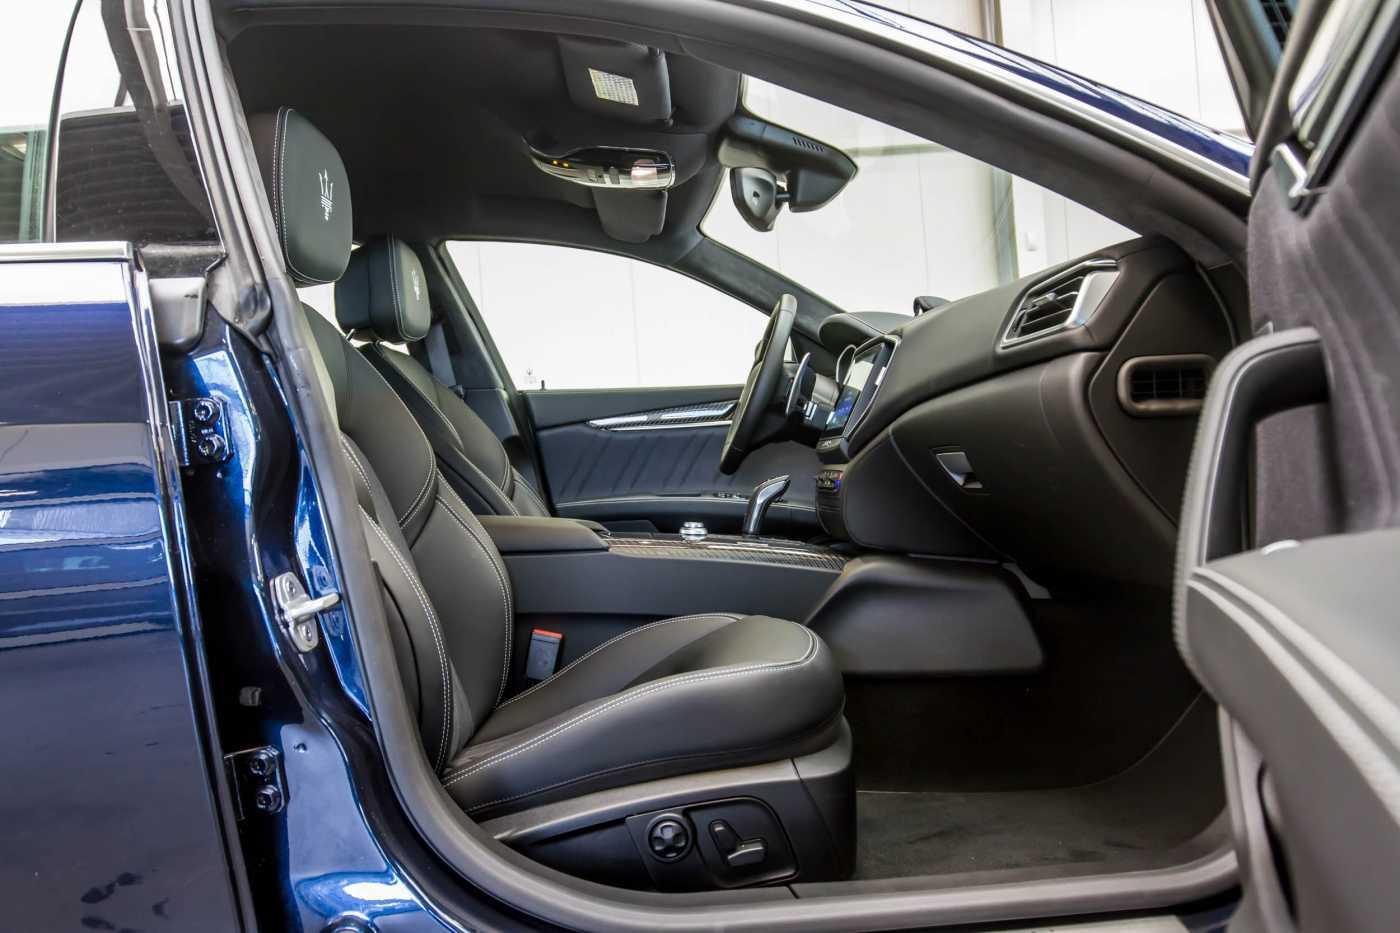 Maserati Ghibli Diesel GranLusso Keyless Sports Exhaust LED Camera 9/29